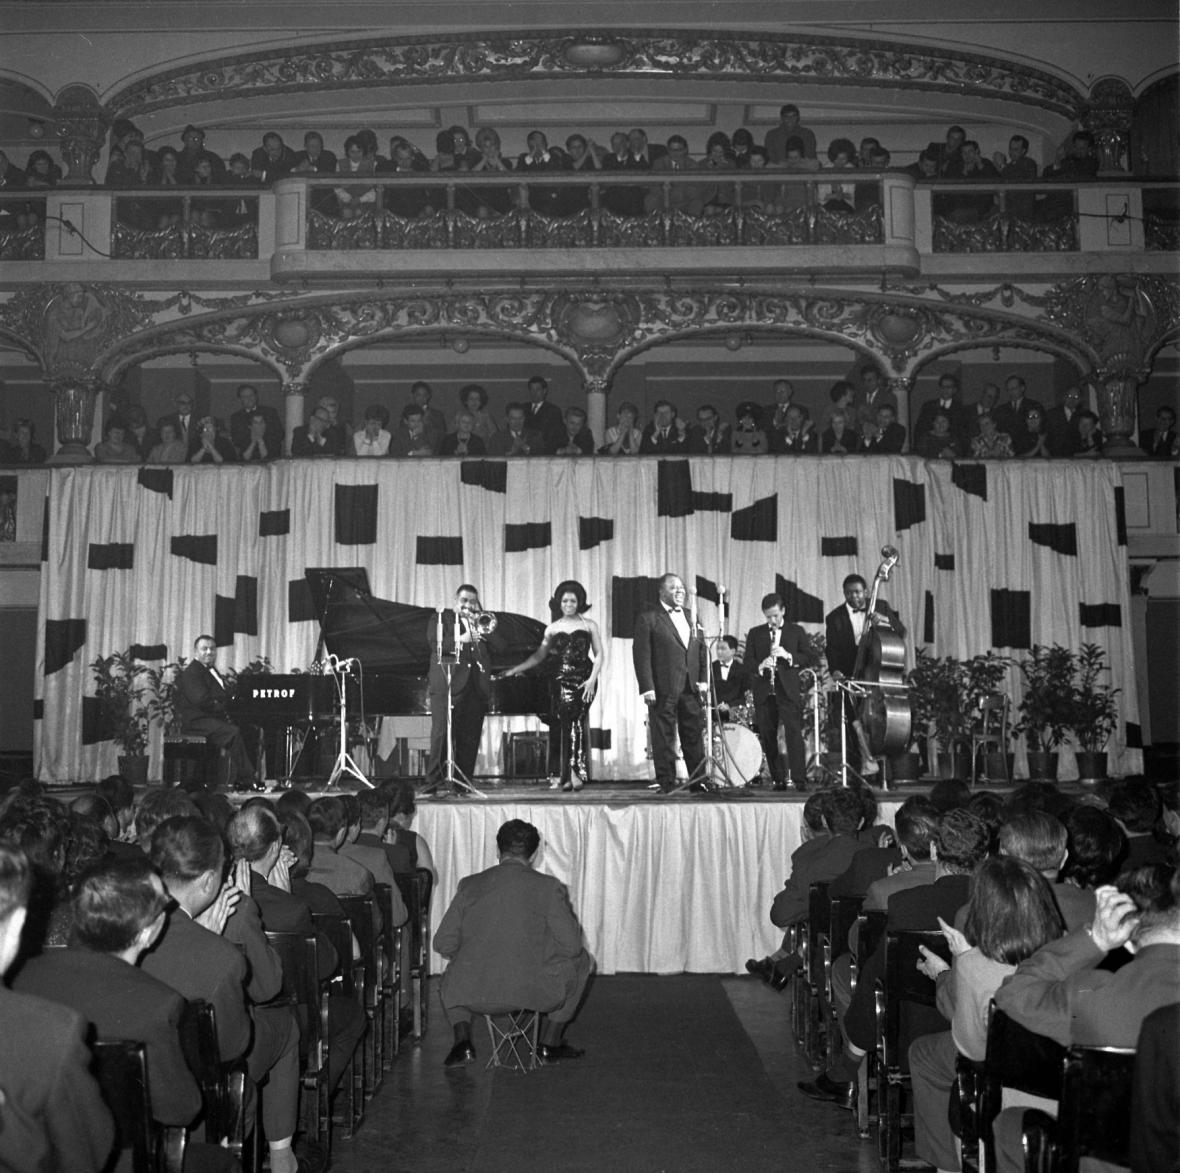 Armstronga v Praze doprovázela jeho kapela i manželka